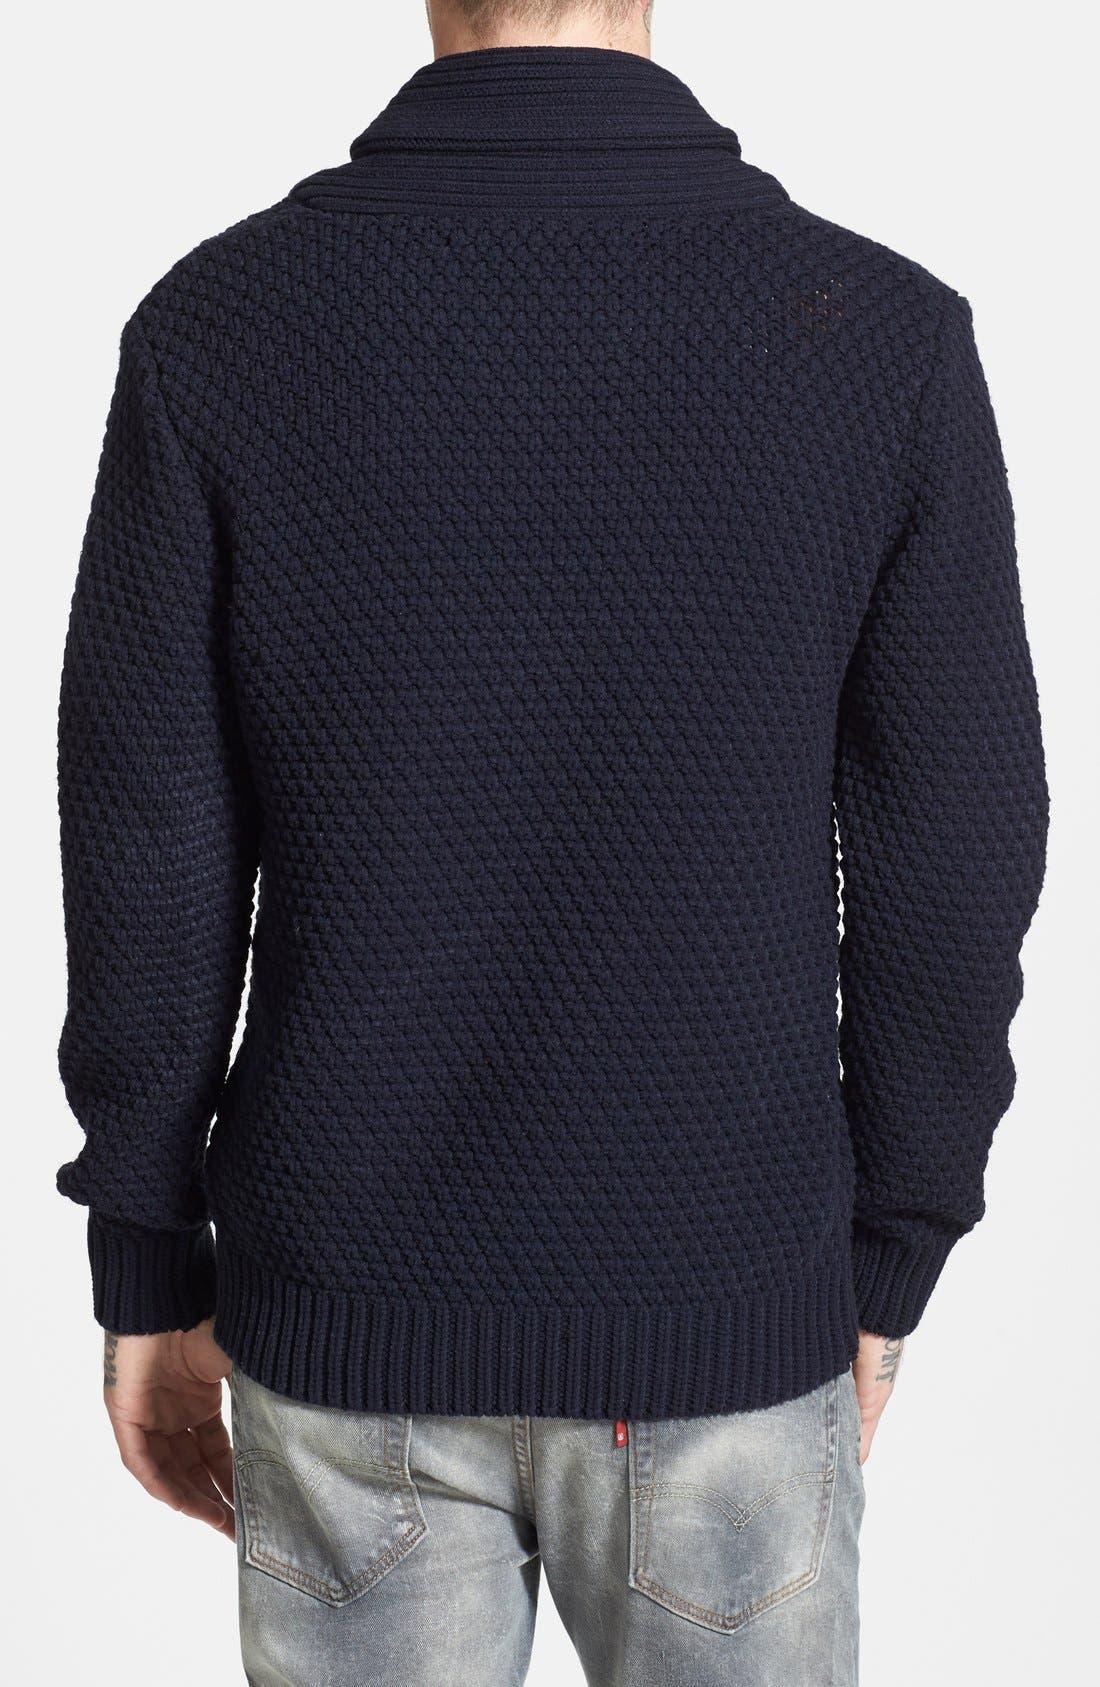 Shawl Collar Sweater,                             Alternate thumbnail 3, color,                             020